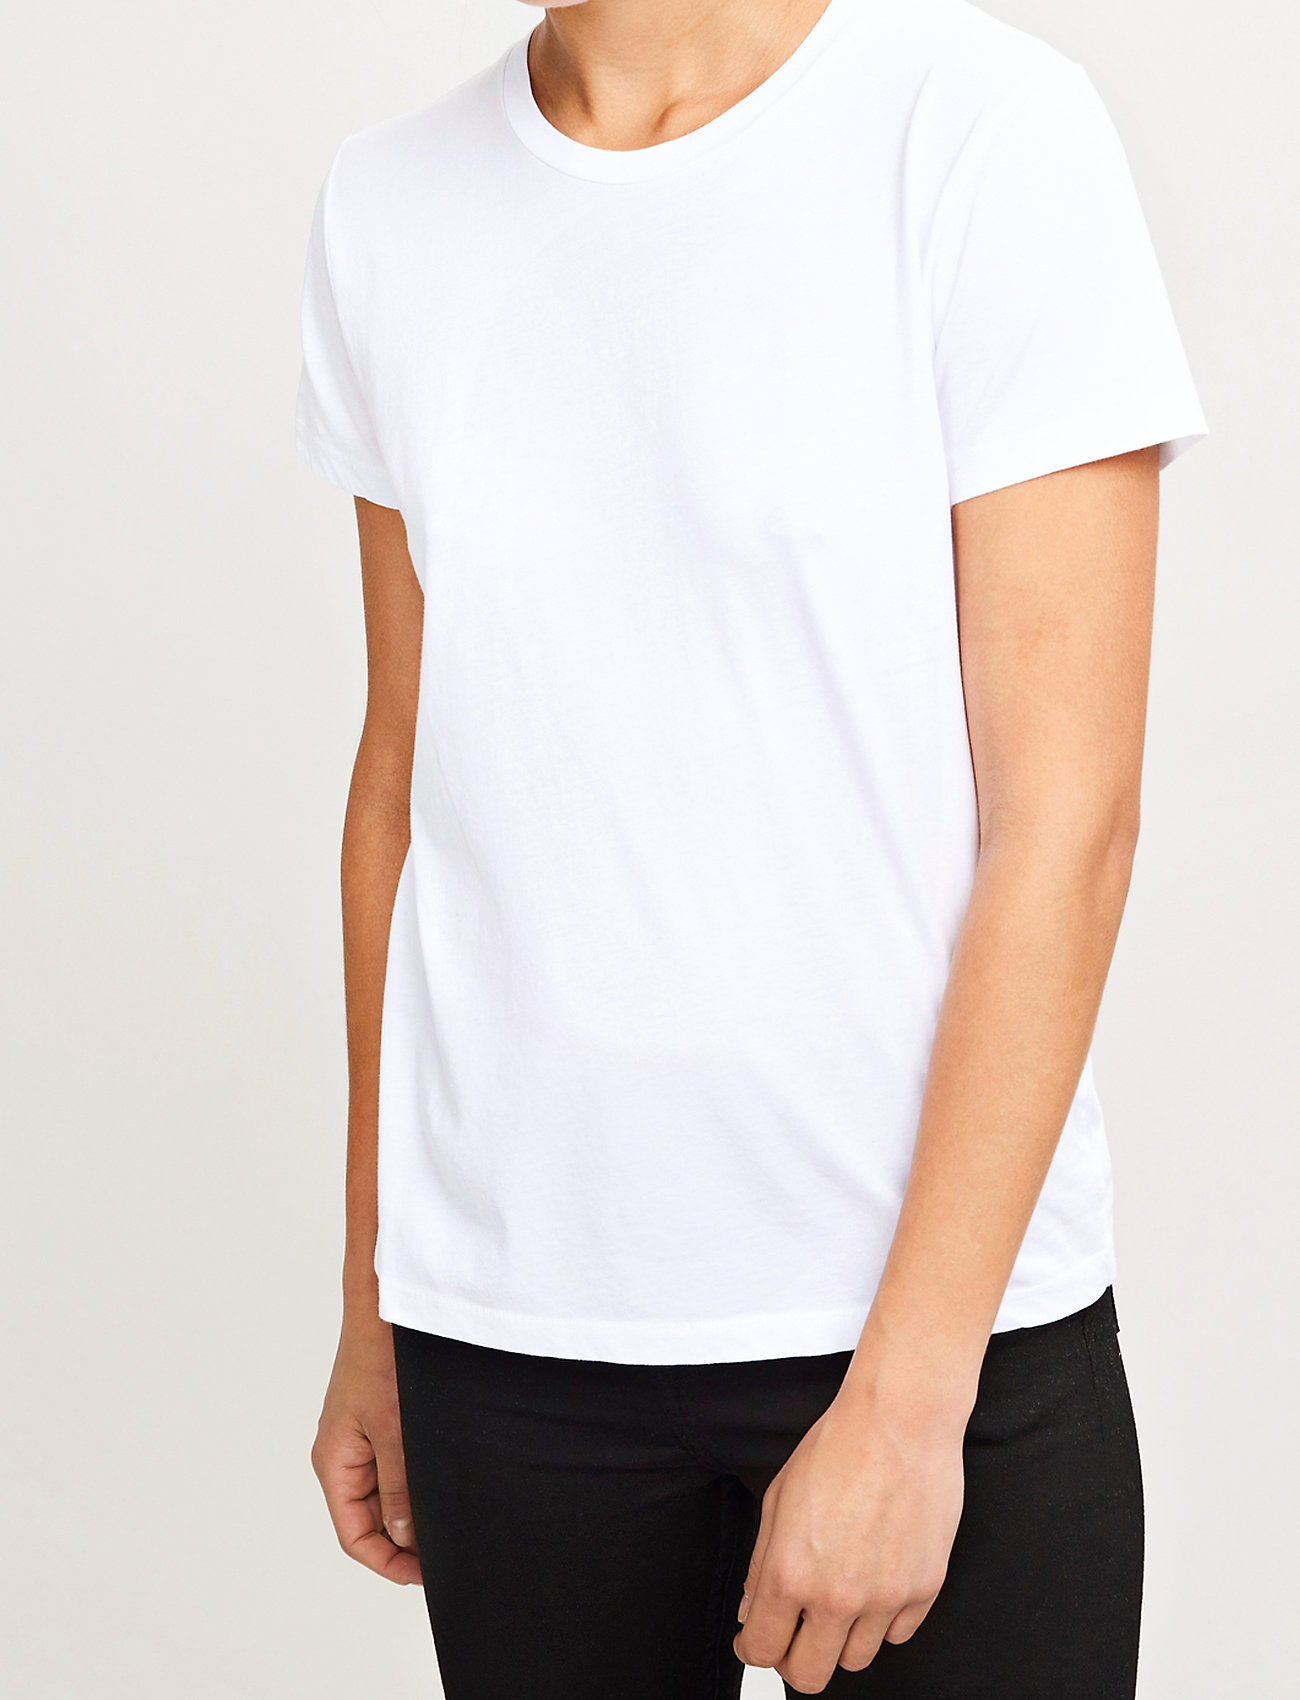 Samsøe Samsøe - Solly tee solid 205 - t-shirts - white - 0